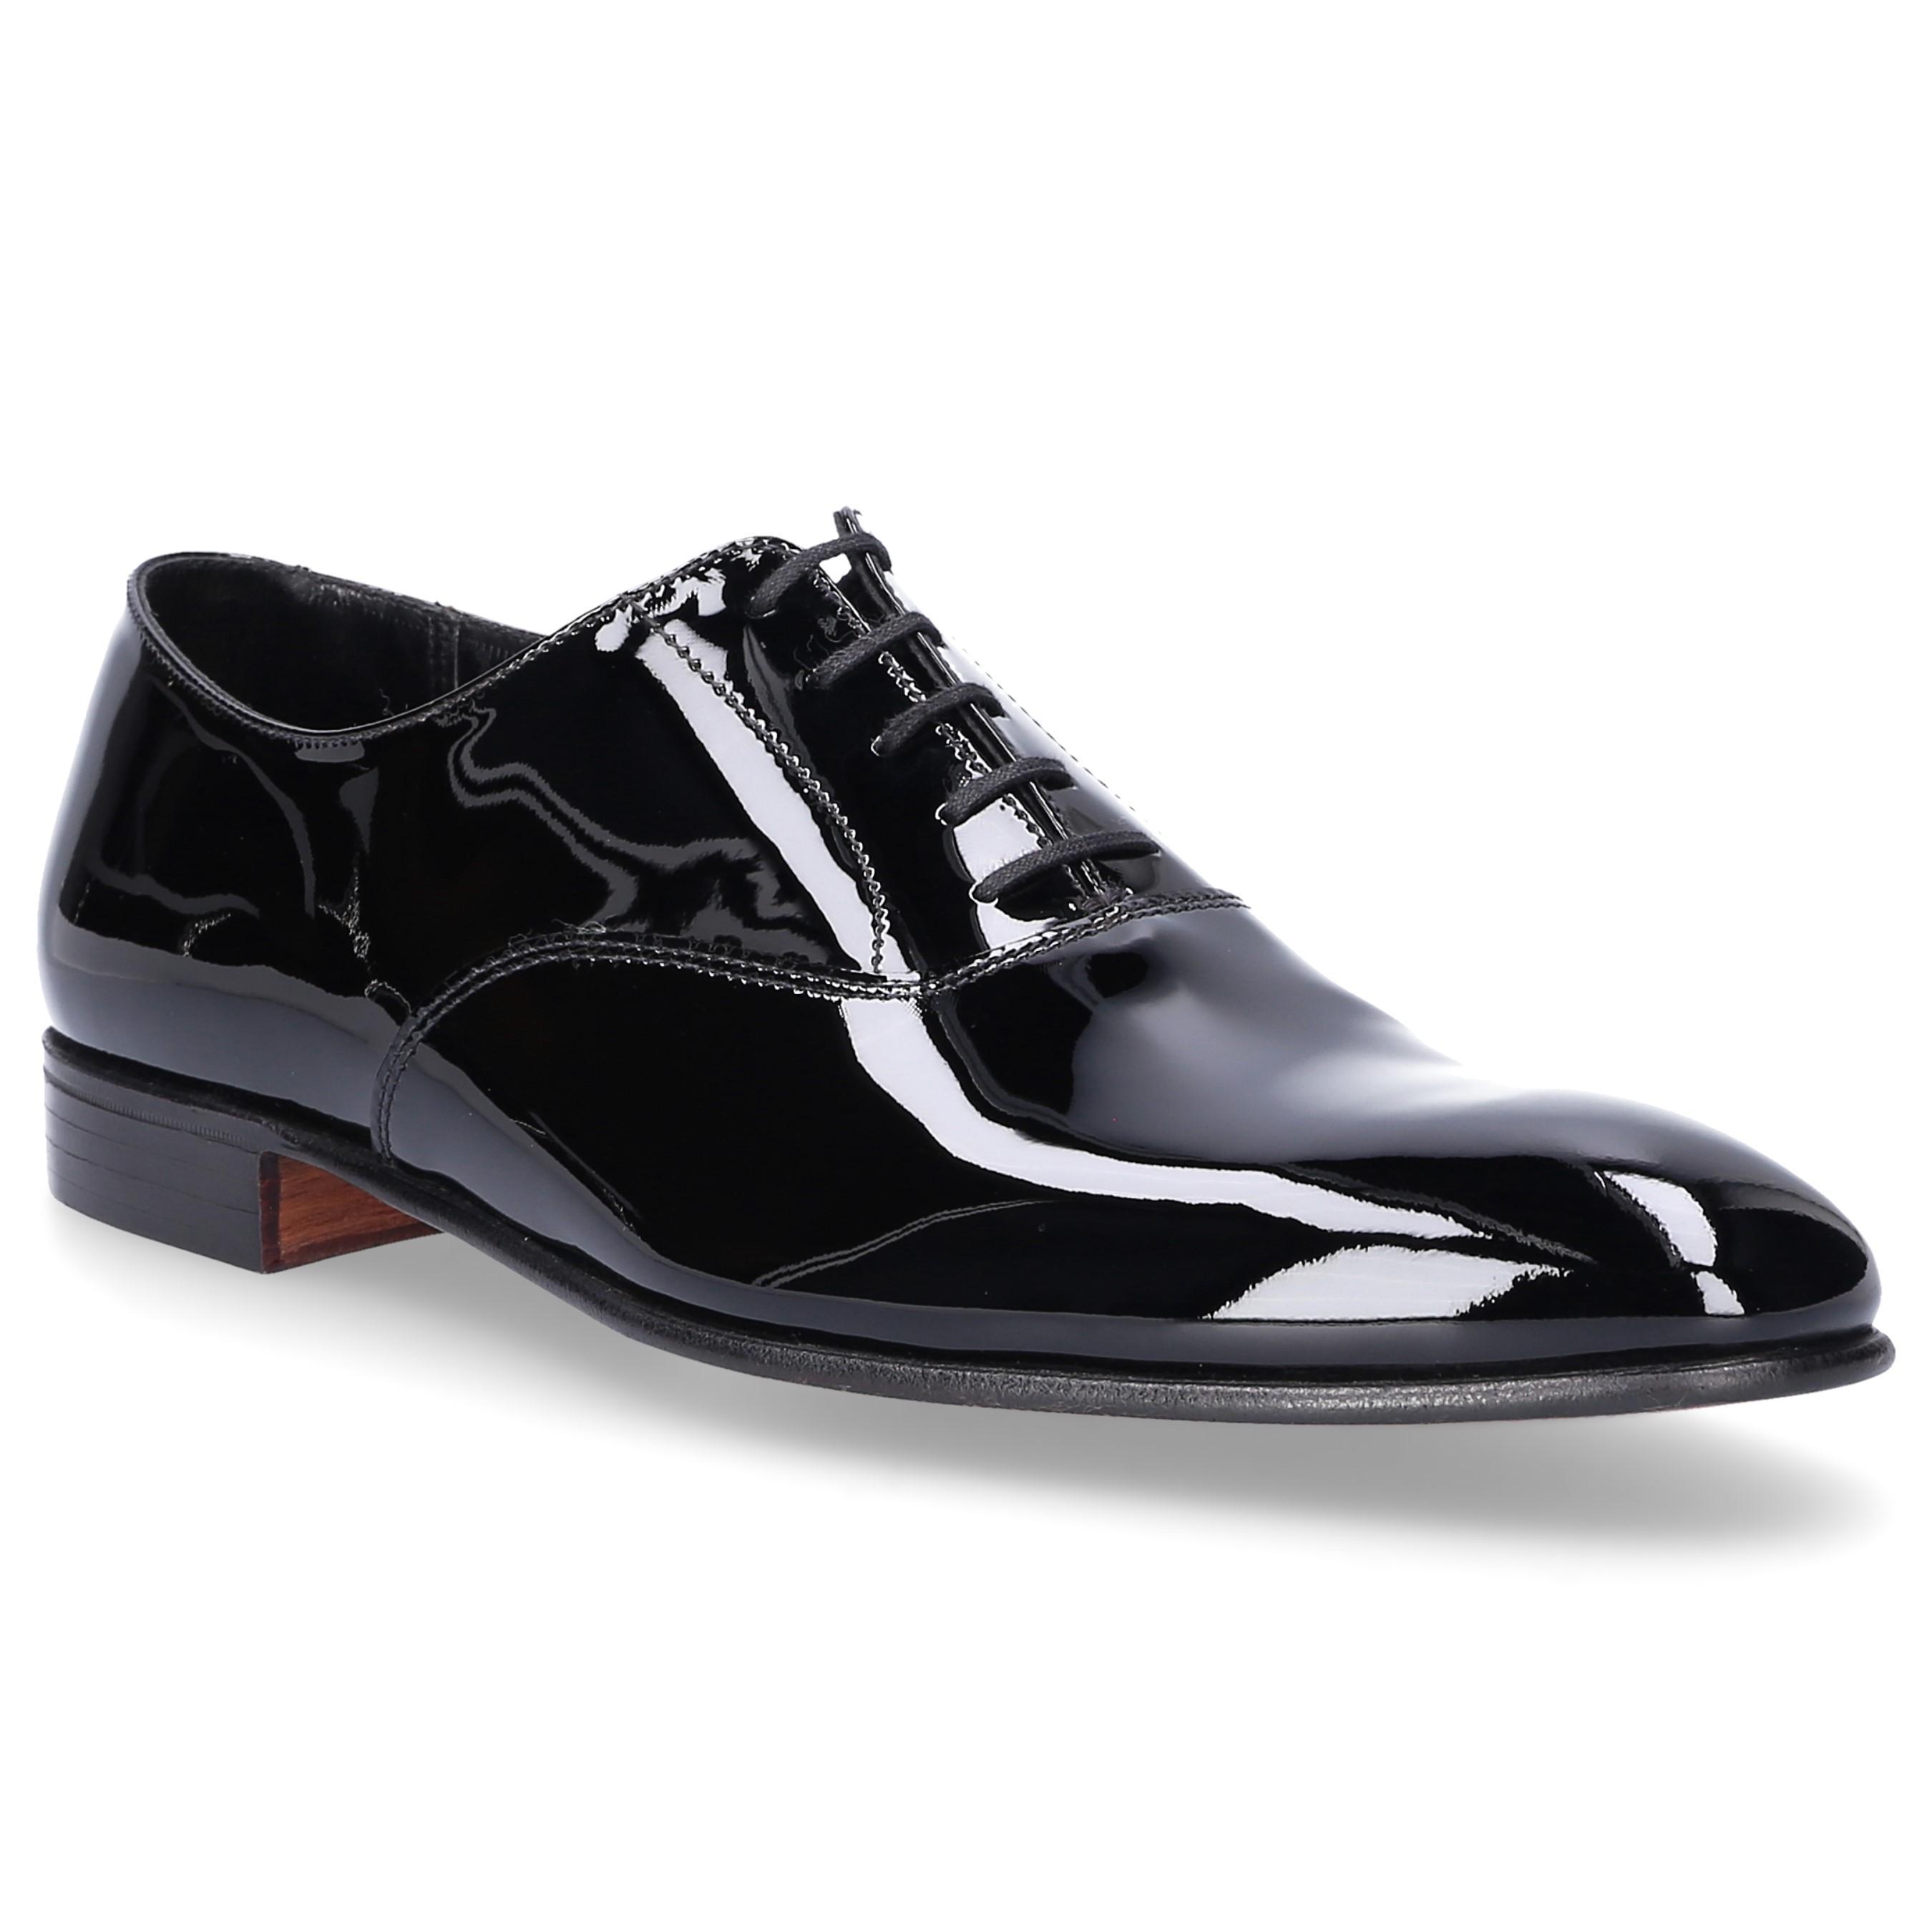 3083e84bf7f Crockett and Jones Oxford Cheam Patent Leather Black in Black for ...